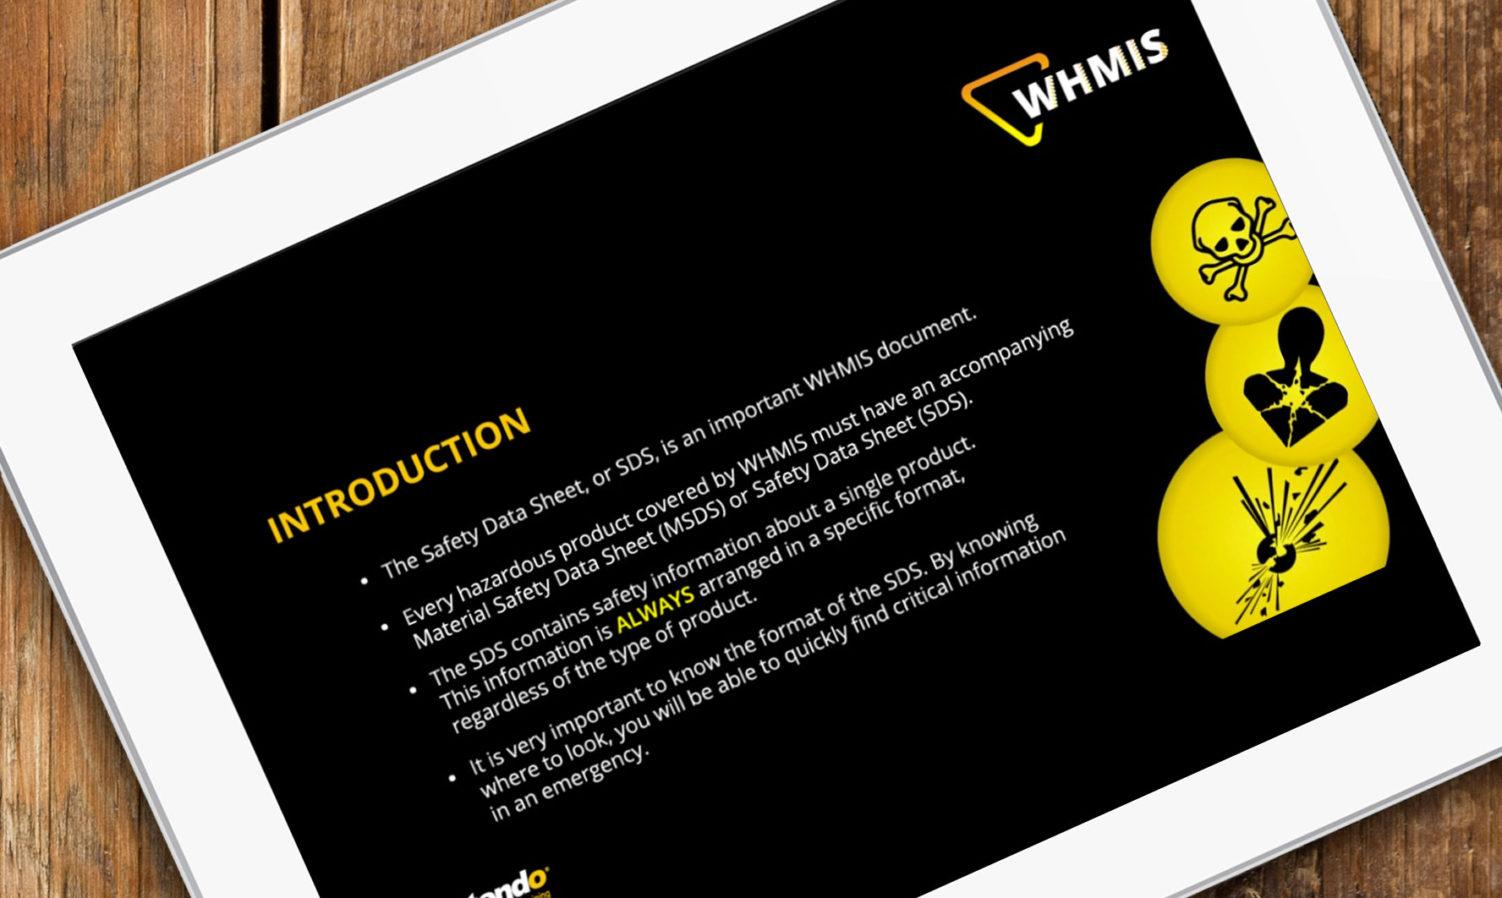 WHMIS_Course_Image2